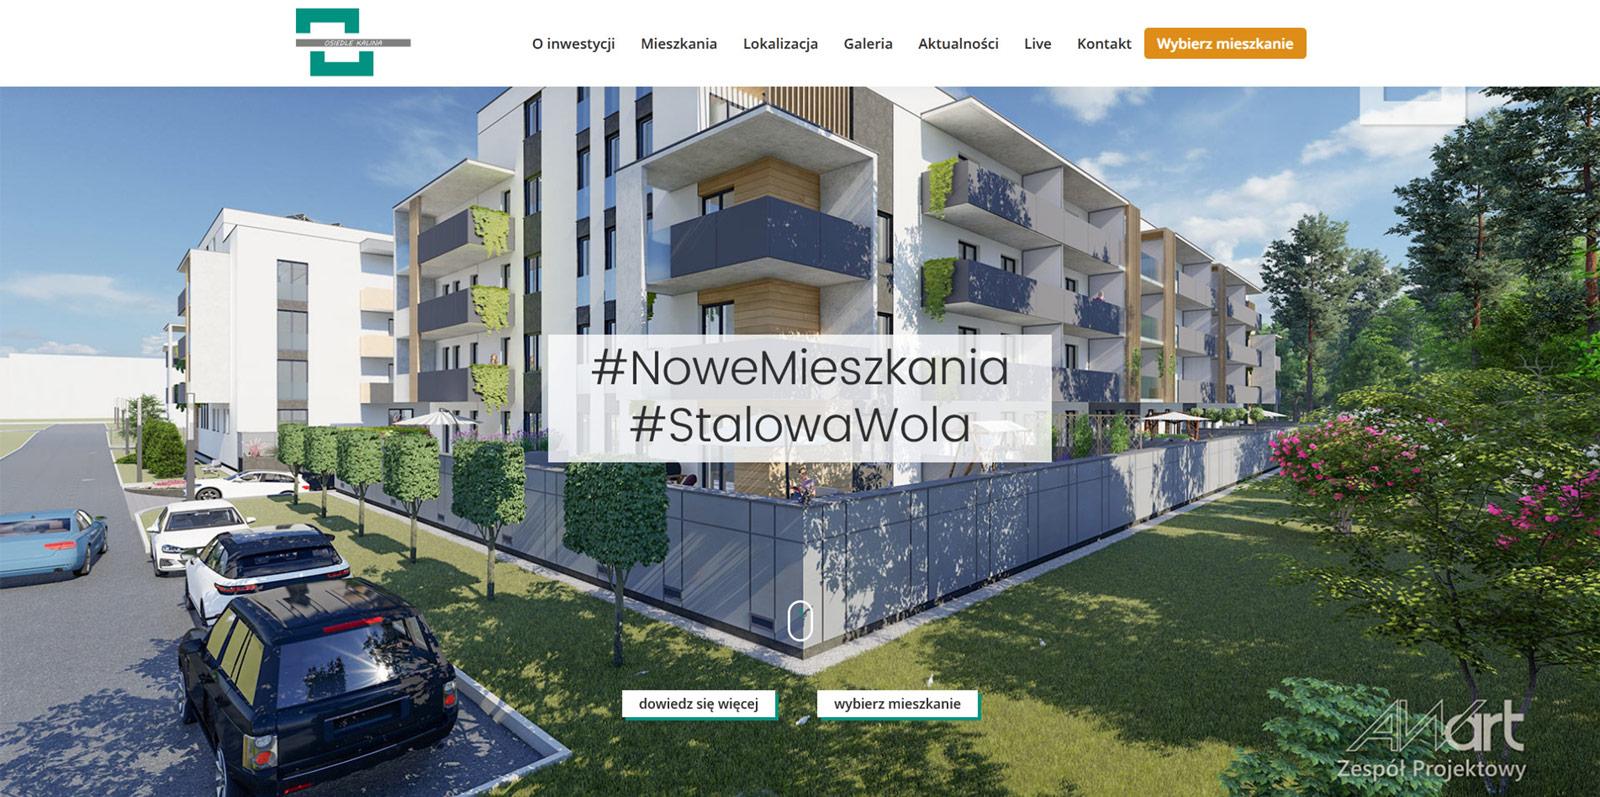 osiedlekalina.pl